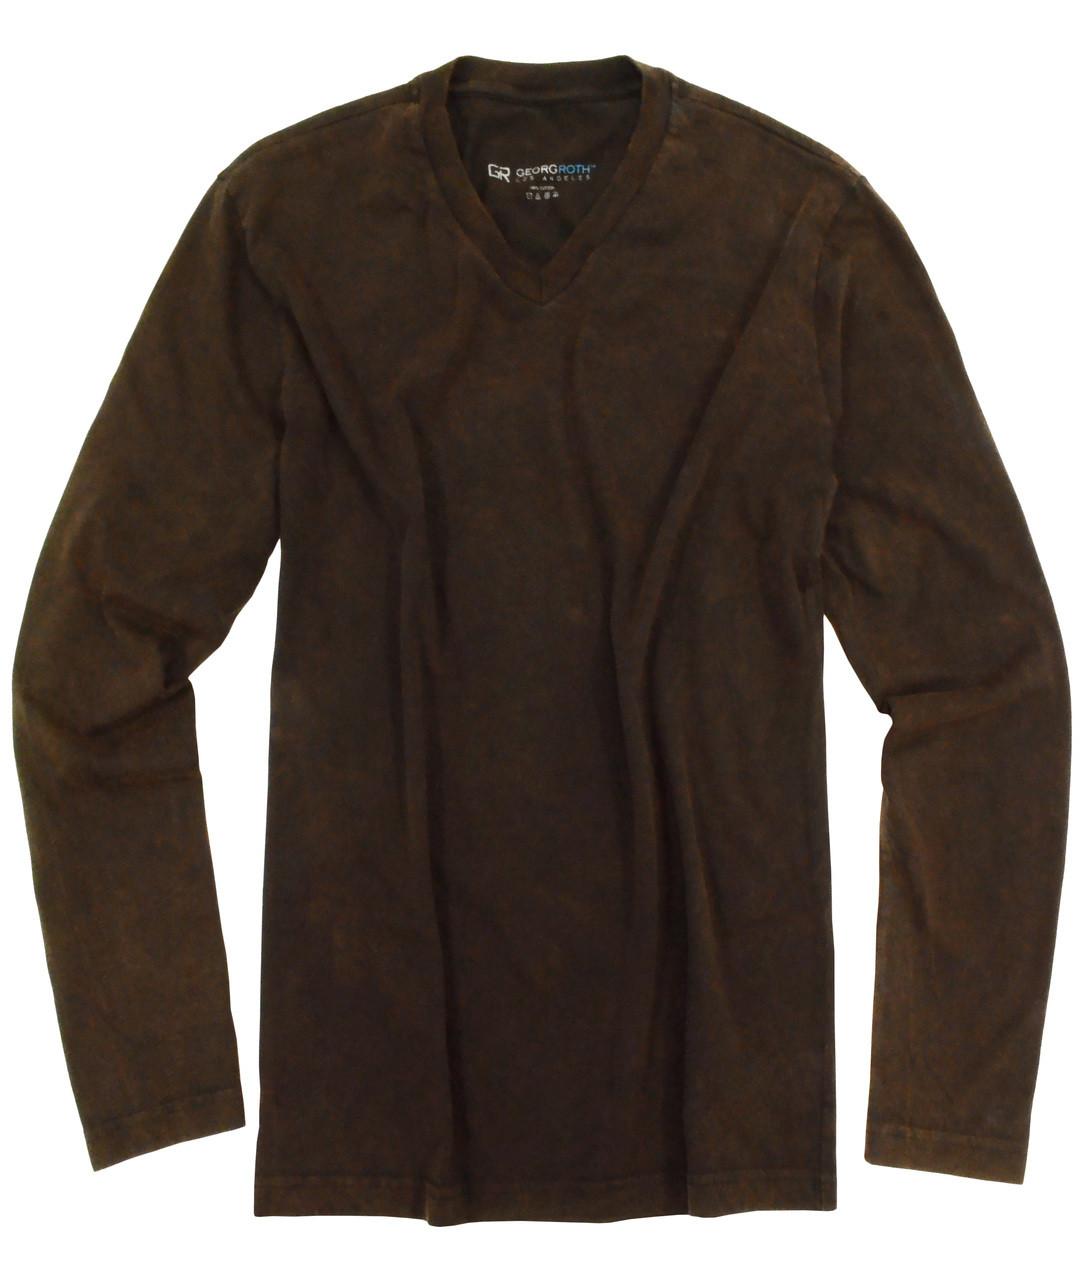 ecf44c91 Luxury V-Neck Long Sleeve Pima Cotton Mens T-Shirt Garment Dyed brown  TVLS-8014